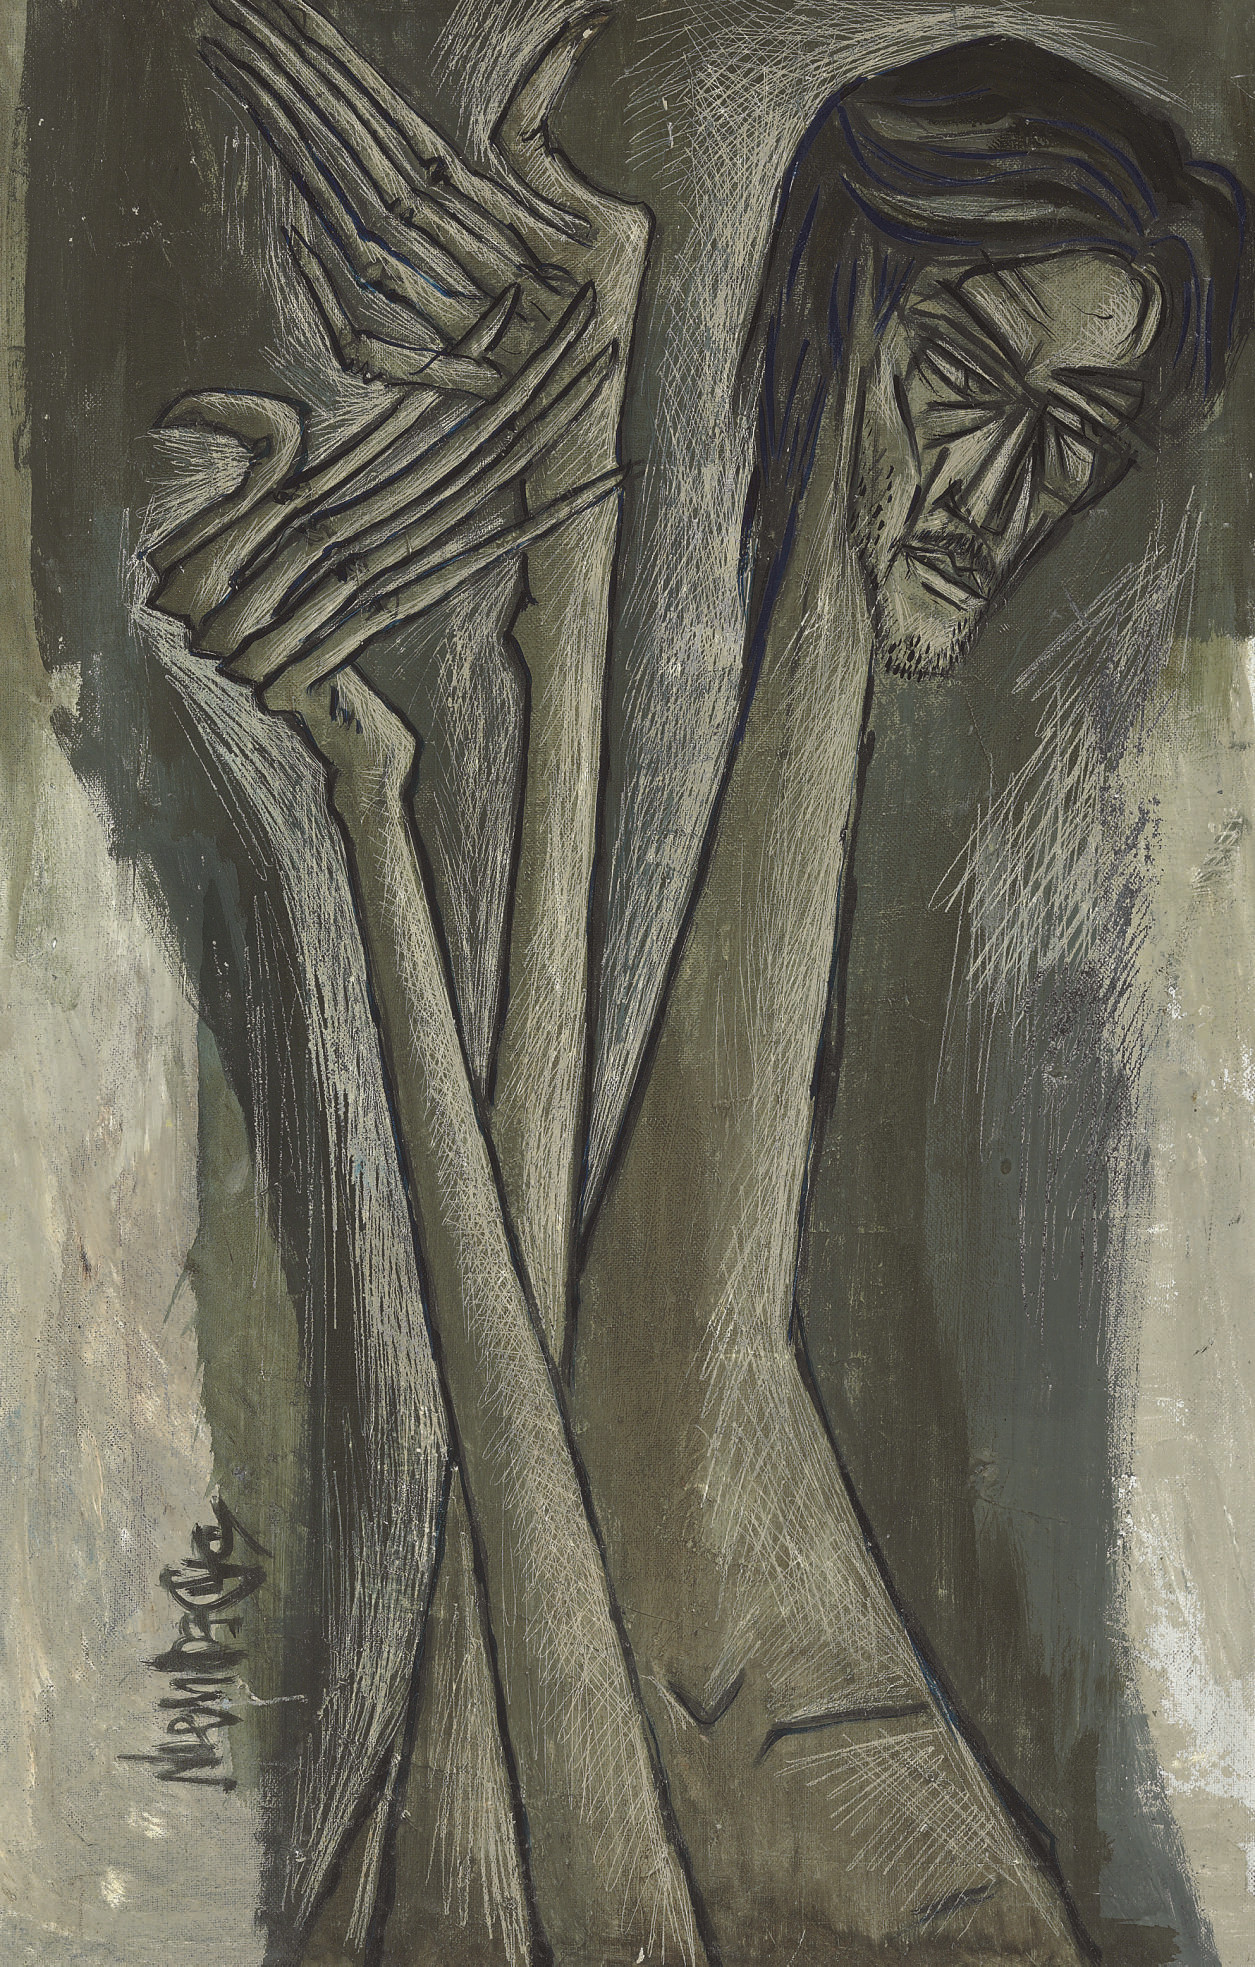 SADEQUAIN (1930-1987)